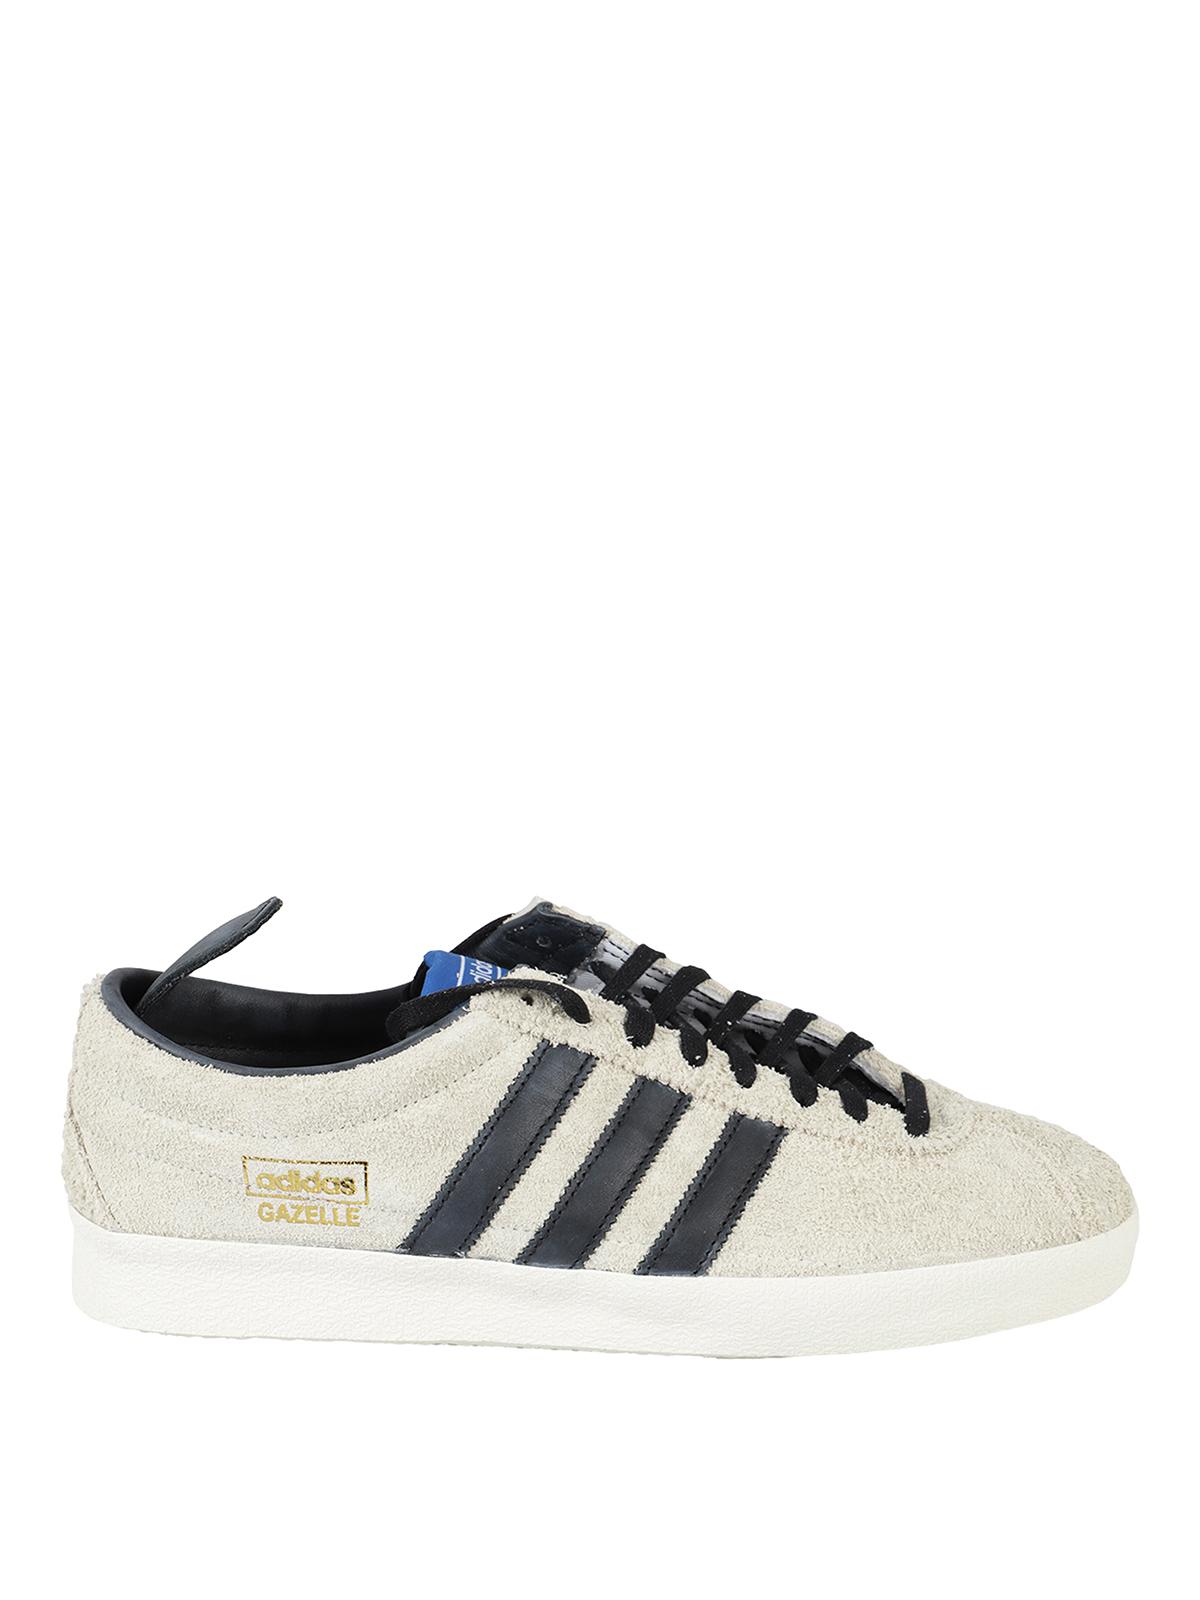 Adidas Originals Shoes GAZELLE VINTAGE SNEAKERS